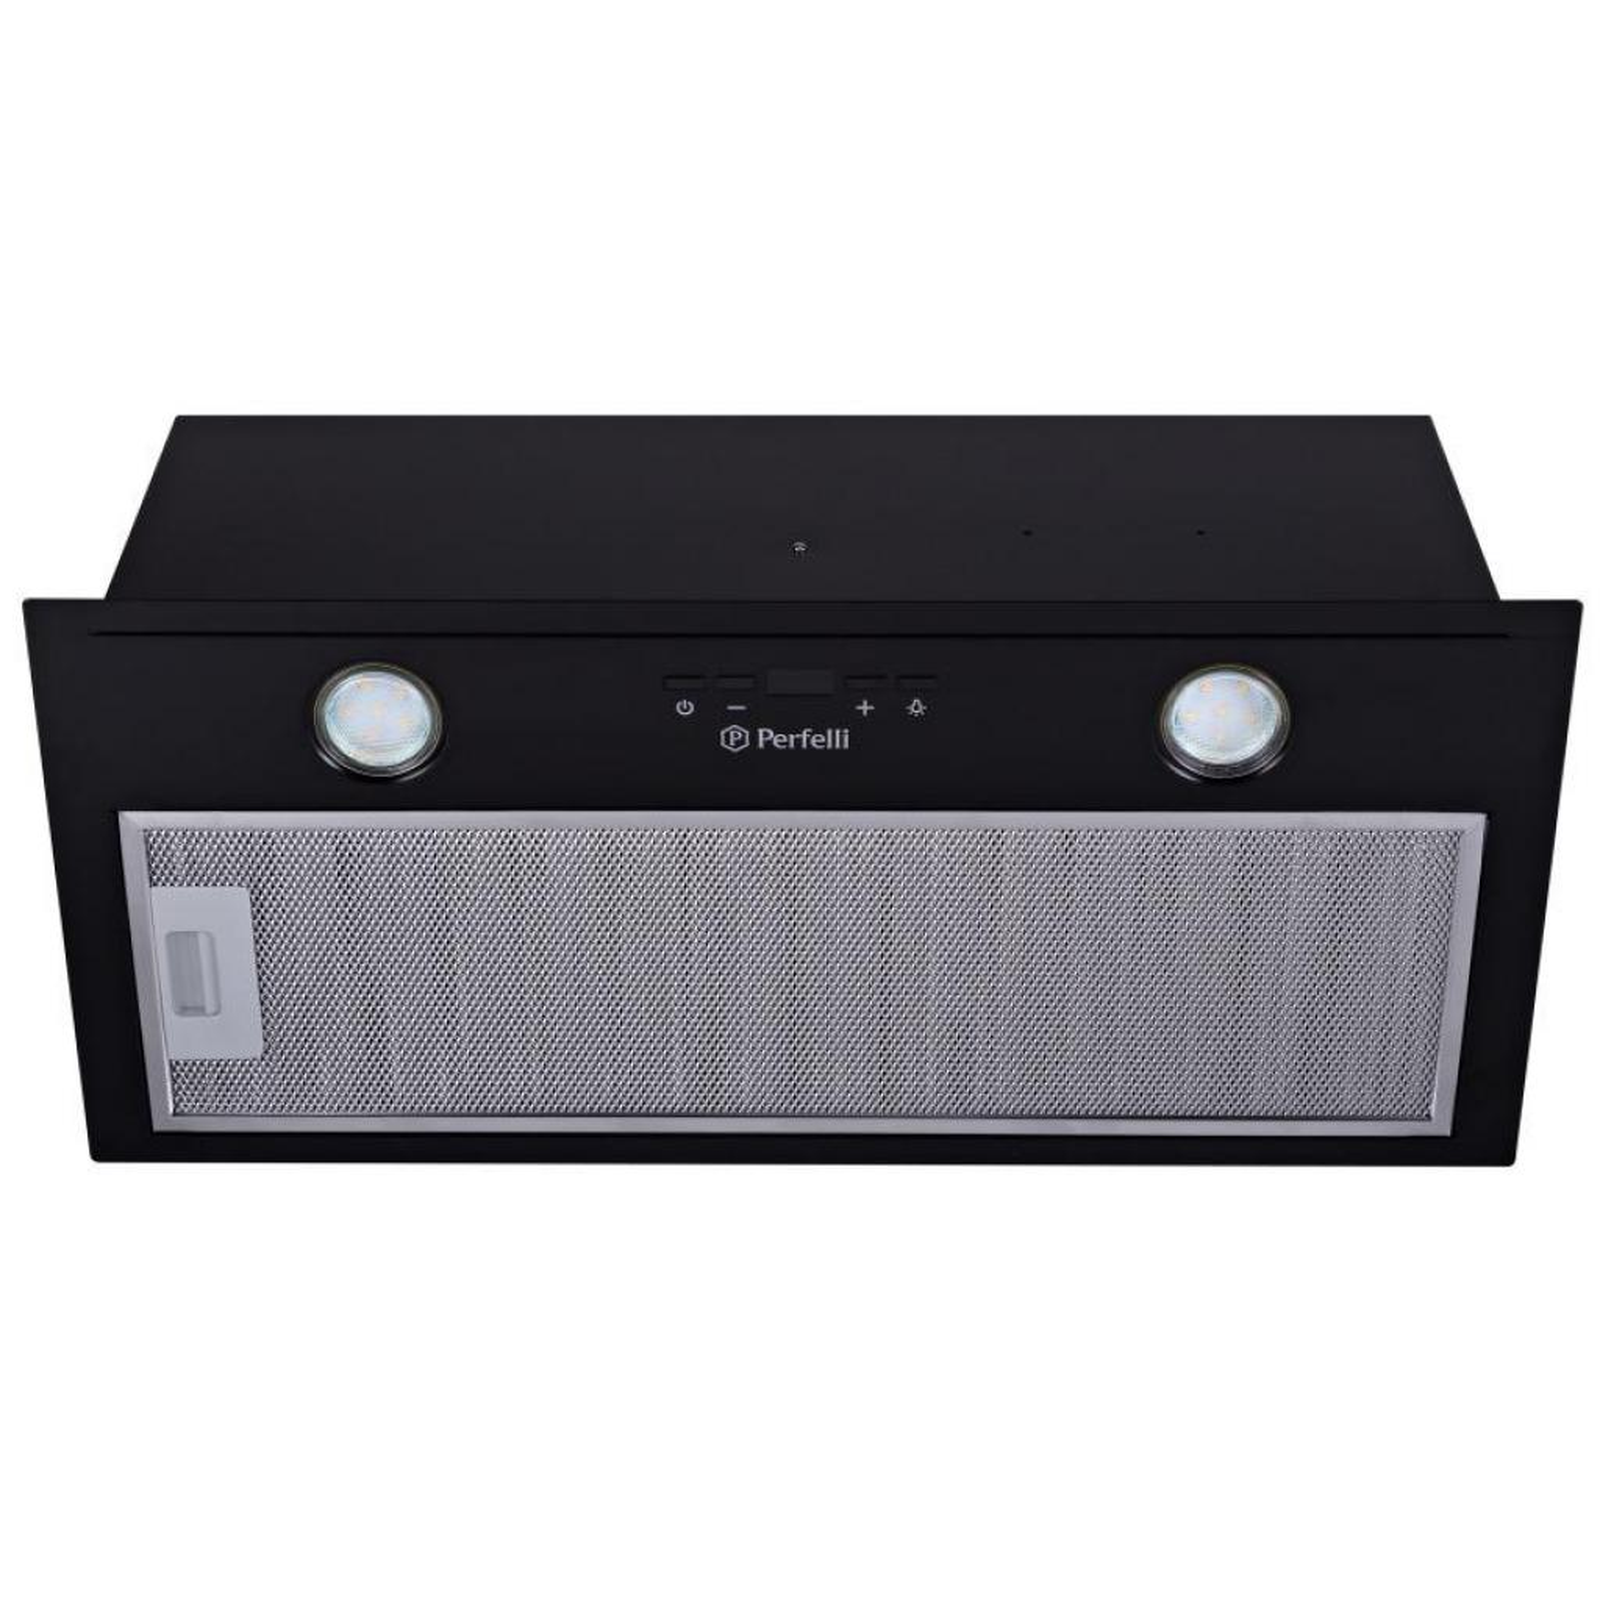 Вытяжка кухонная PERFELLI BIET 6512 A 1000 BL LED